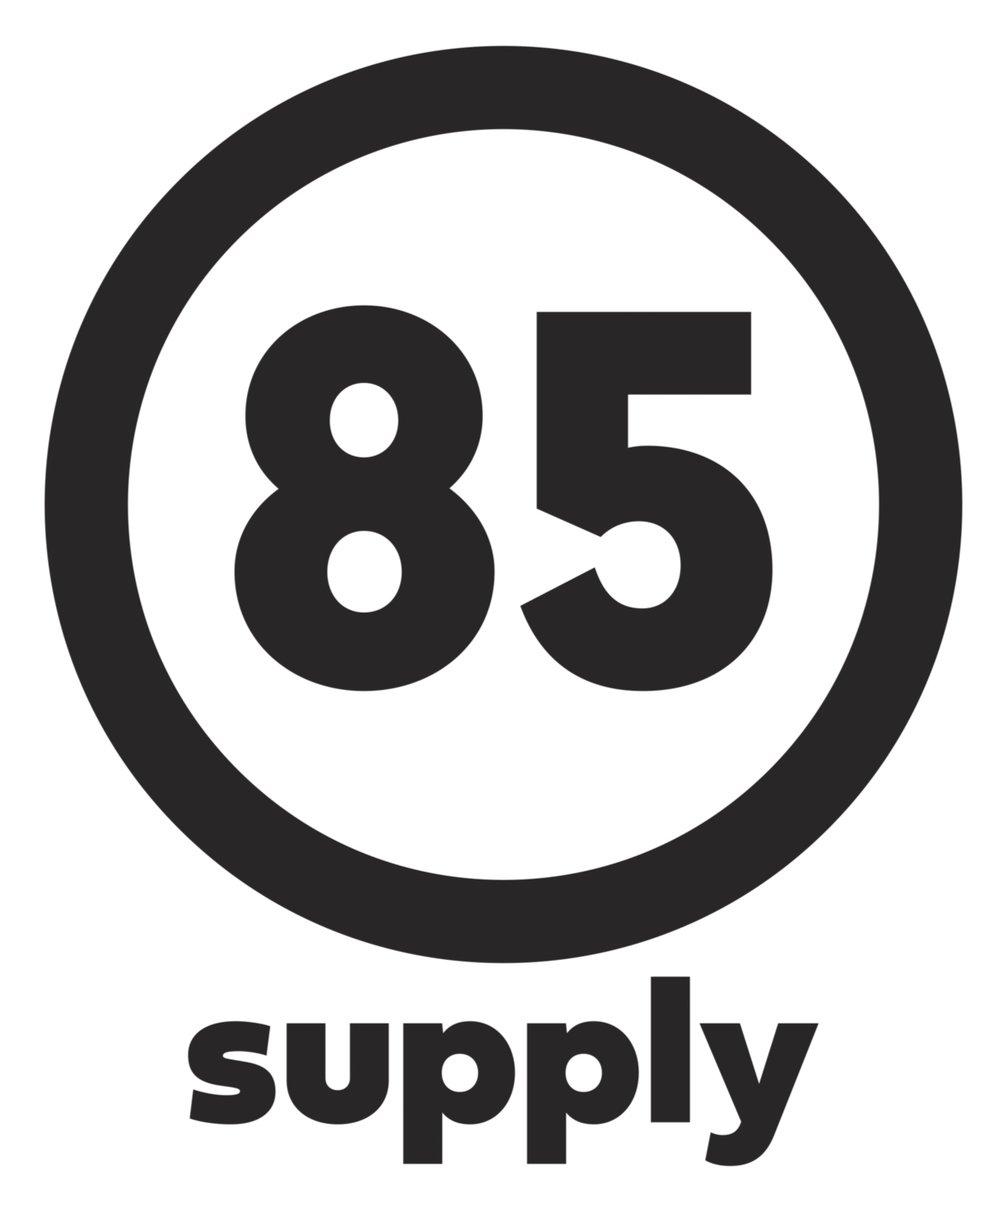 85 Supply